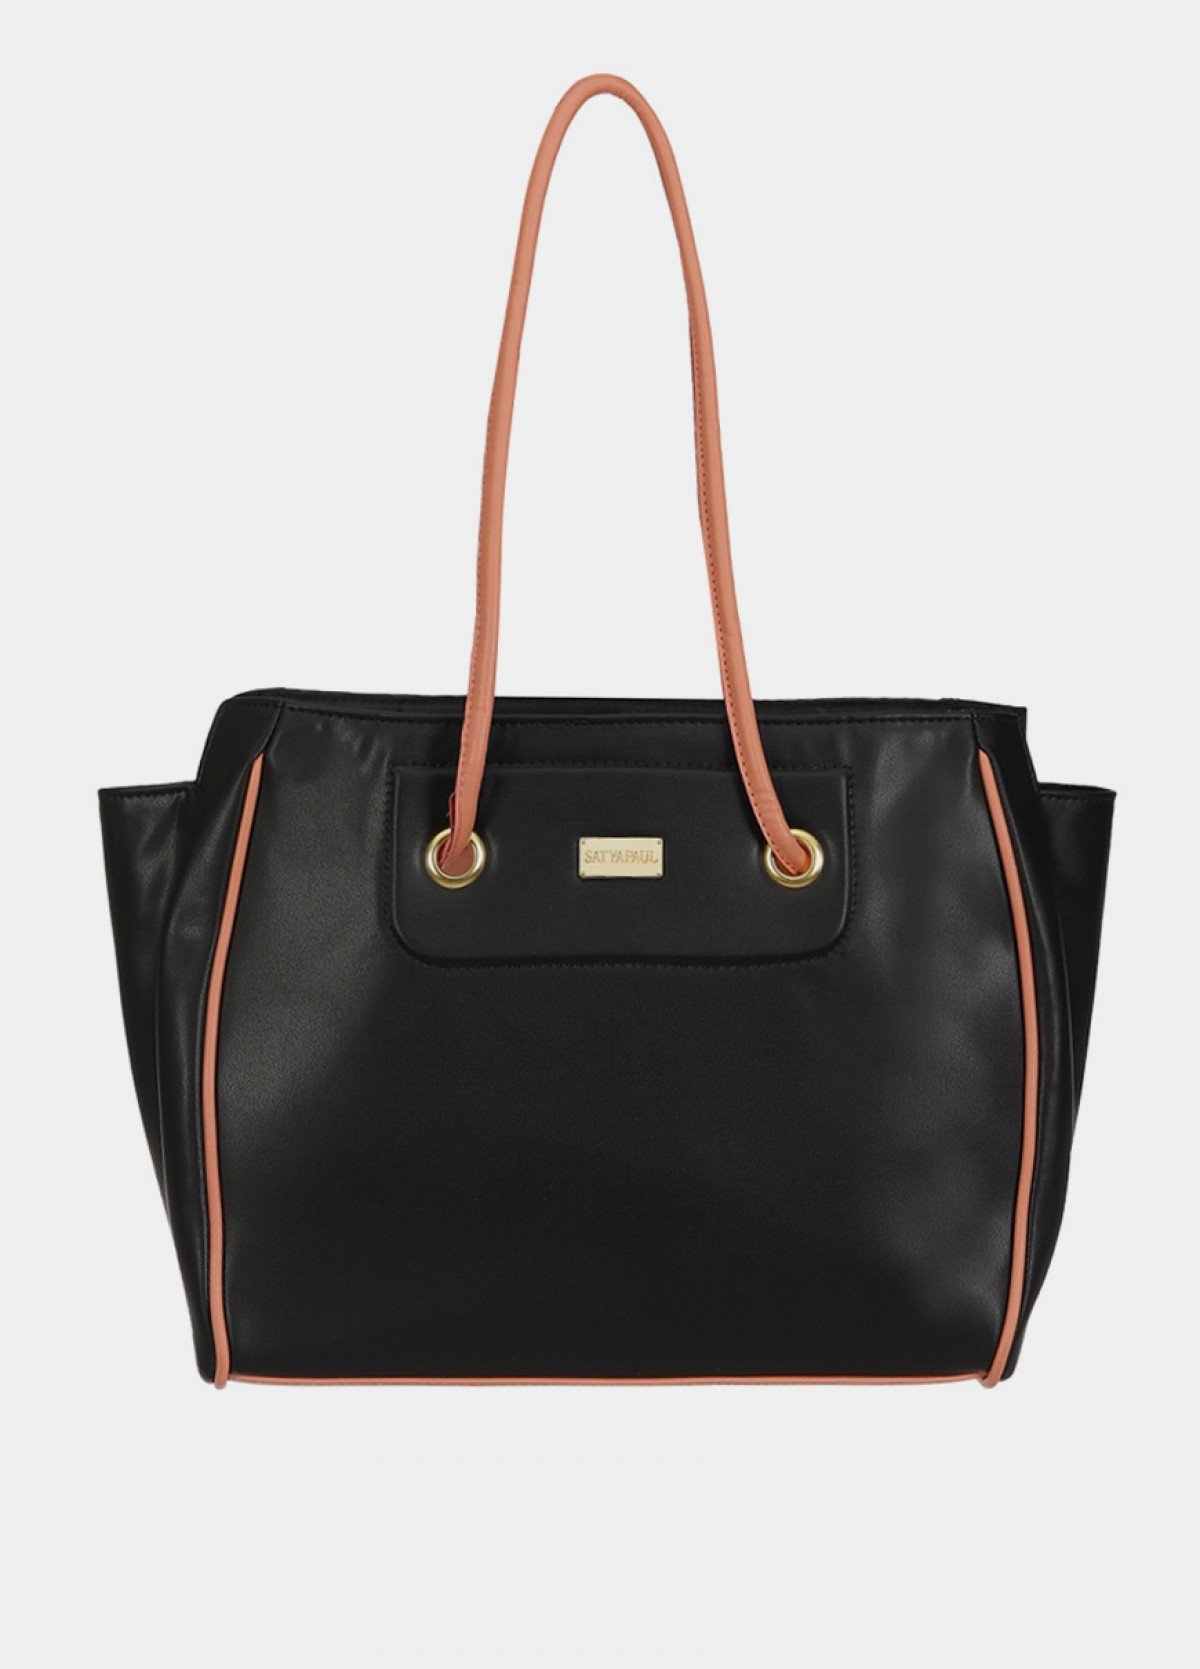 The Satyapaul Black Hand Bag